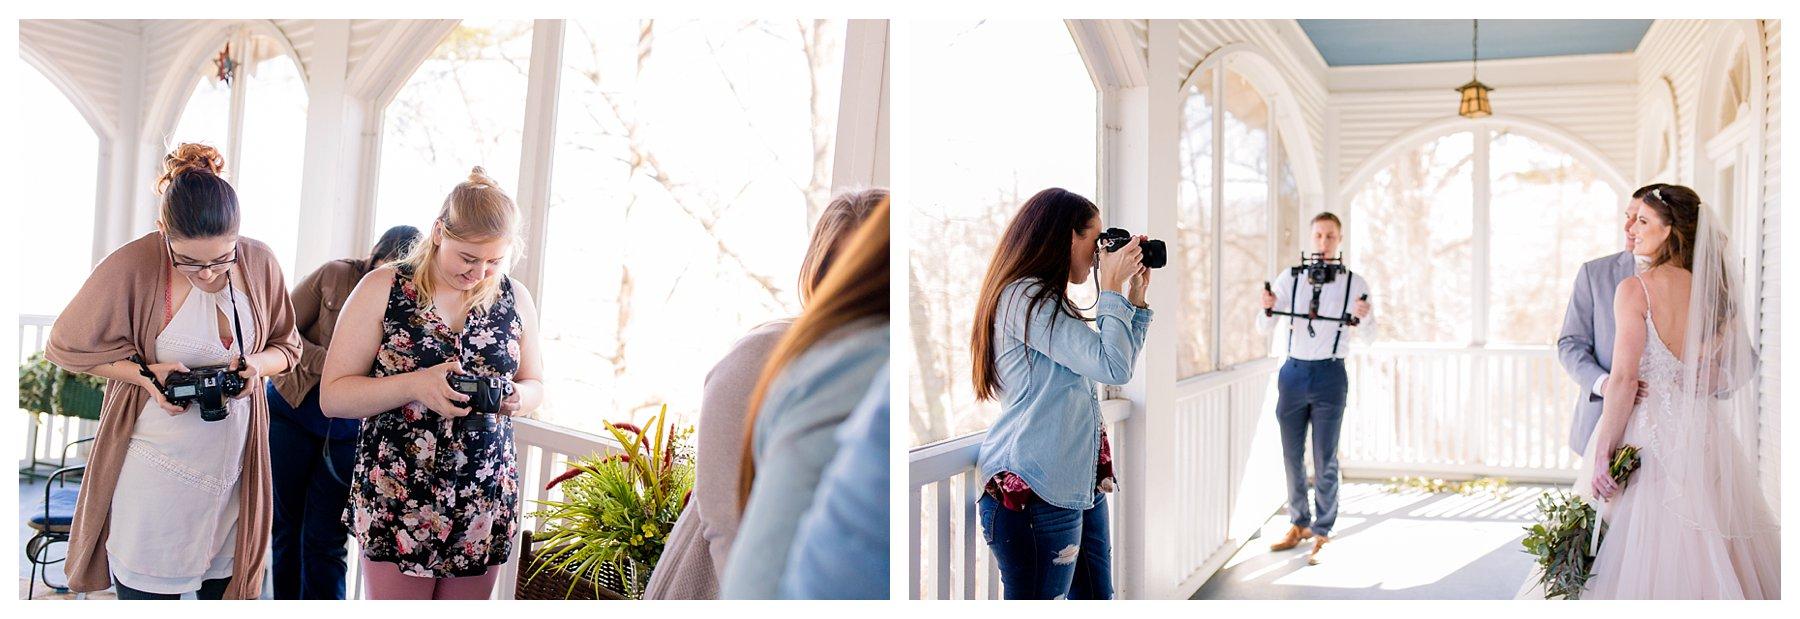 photographer_wedding_saint_louis_Kansas_City_Photography_Videography_workshop_training_styled_engagement_Lake_Ozark_KC_MO_STL_Rolla_Hermann_Saint_James_0398.jpg